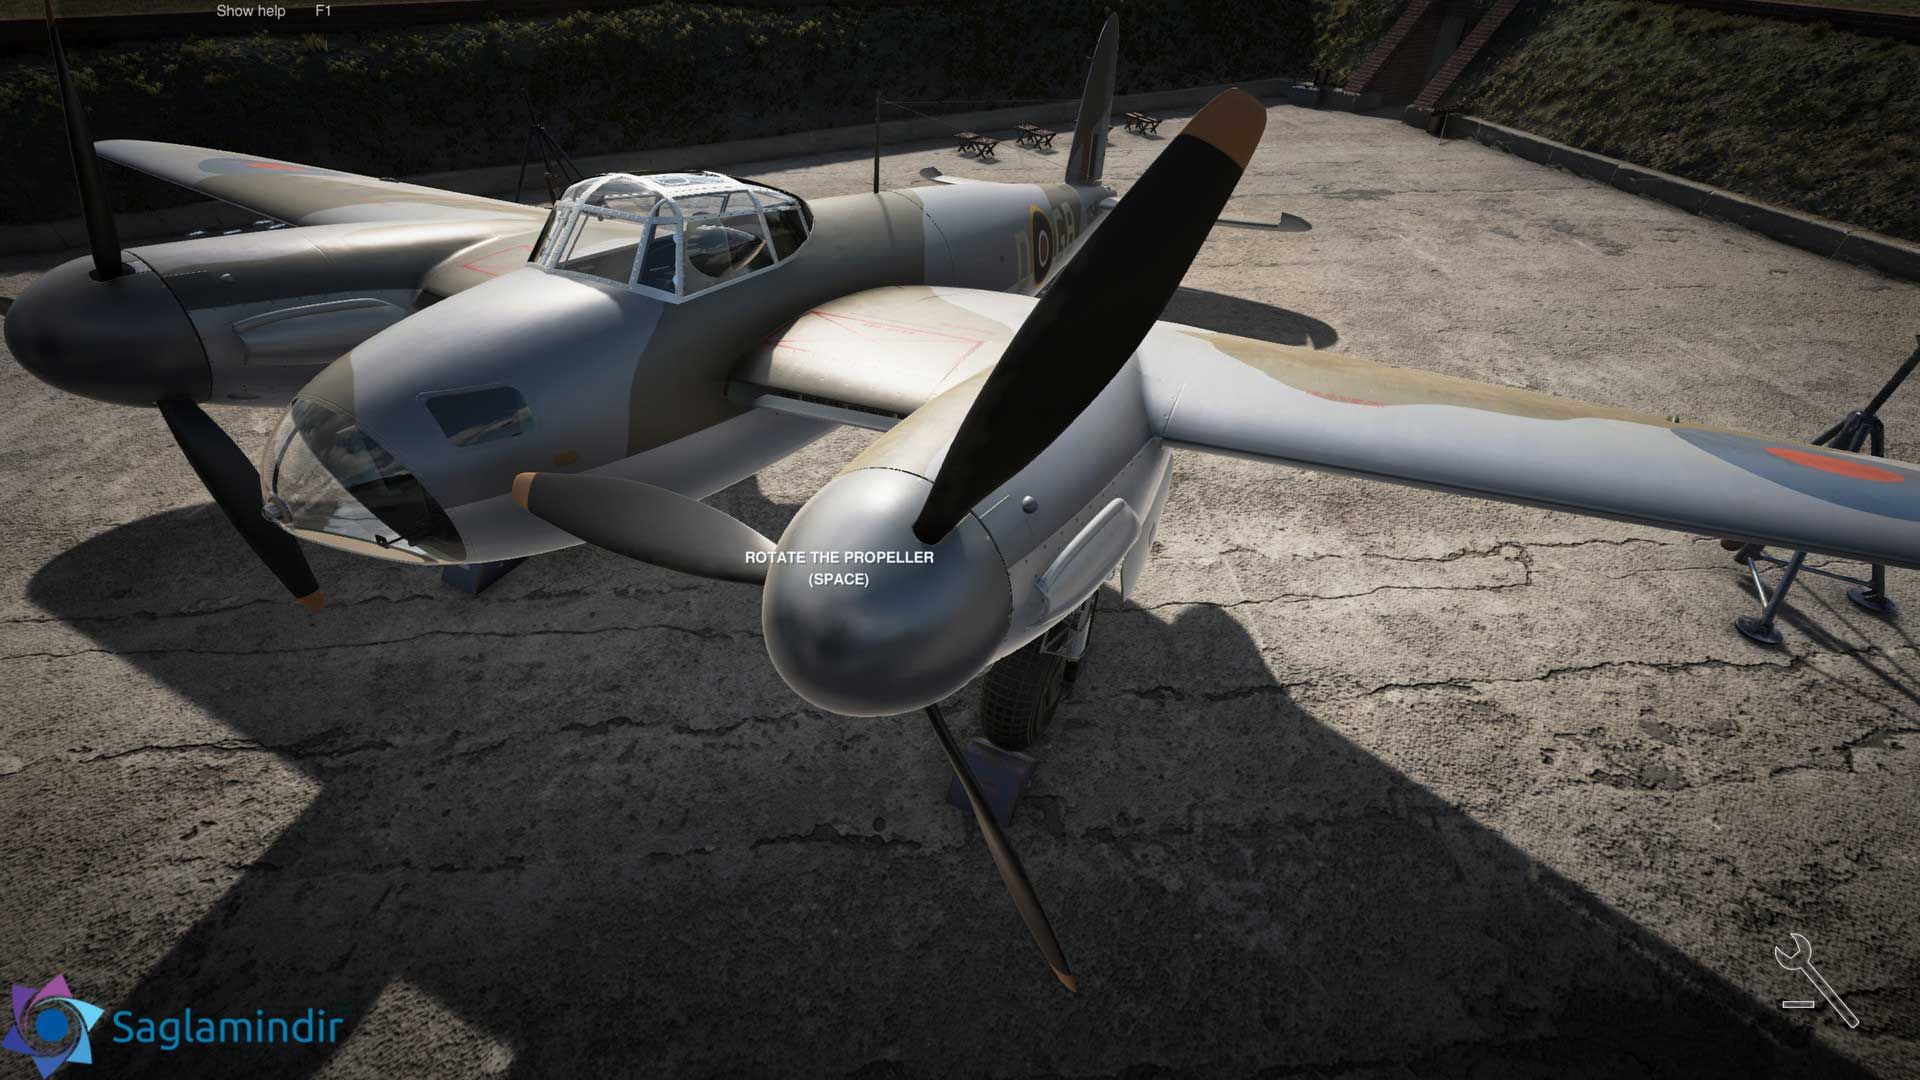 Plane Mechanic Simulator saglamindir